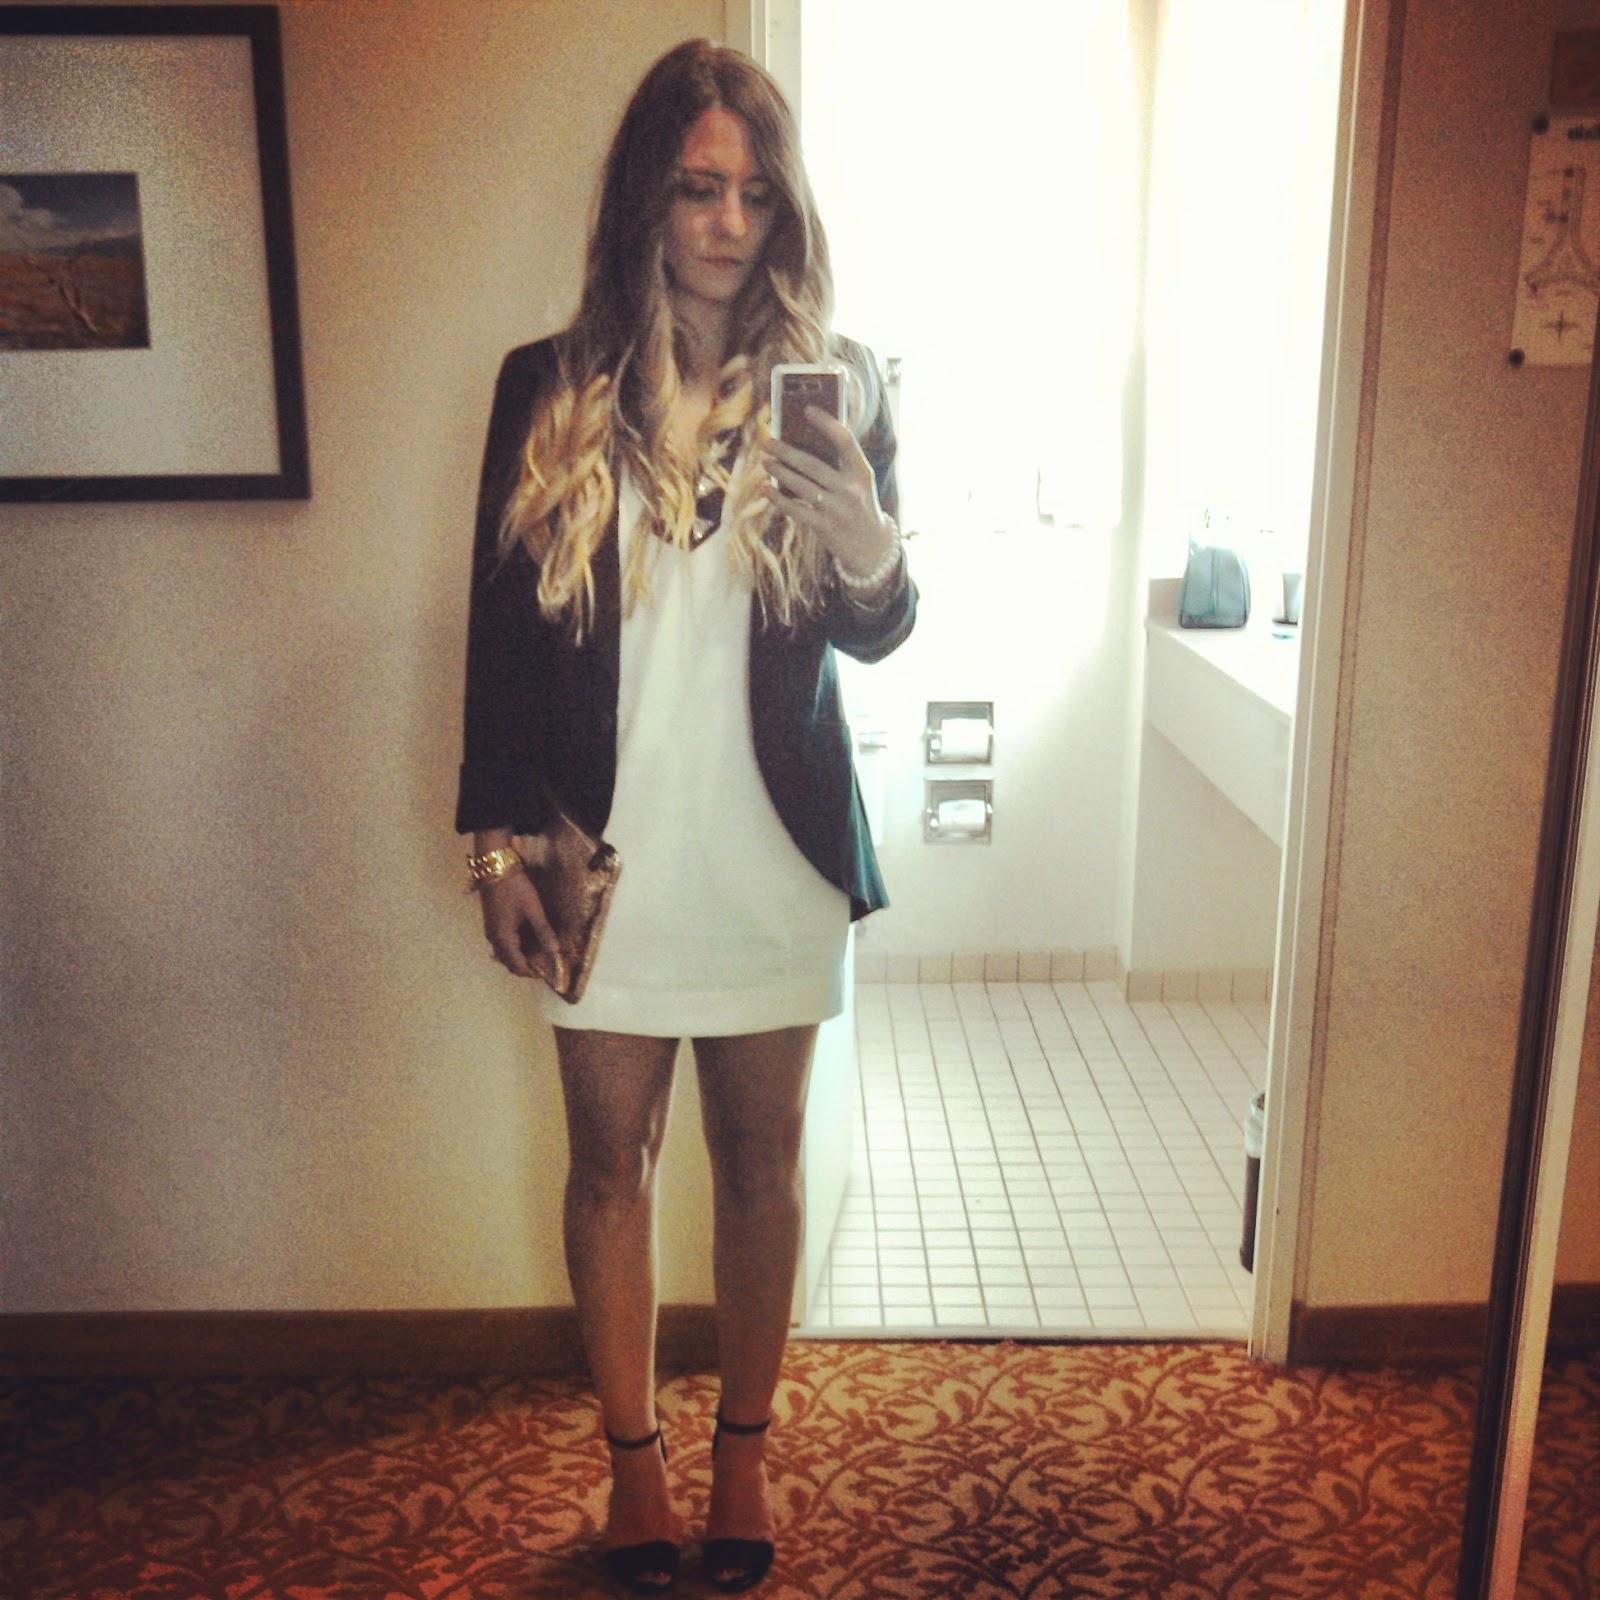 http://1.bp.blogspot.com/-37O0VW1P-Rg/UUNni1GalPI/AAAAAAAAGXc/QBiLPILNTVk/s1600/black-and-white-fashion-trend-las-vegas-hilton-hotel-zara-black-sandals.jpg